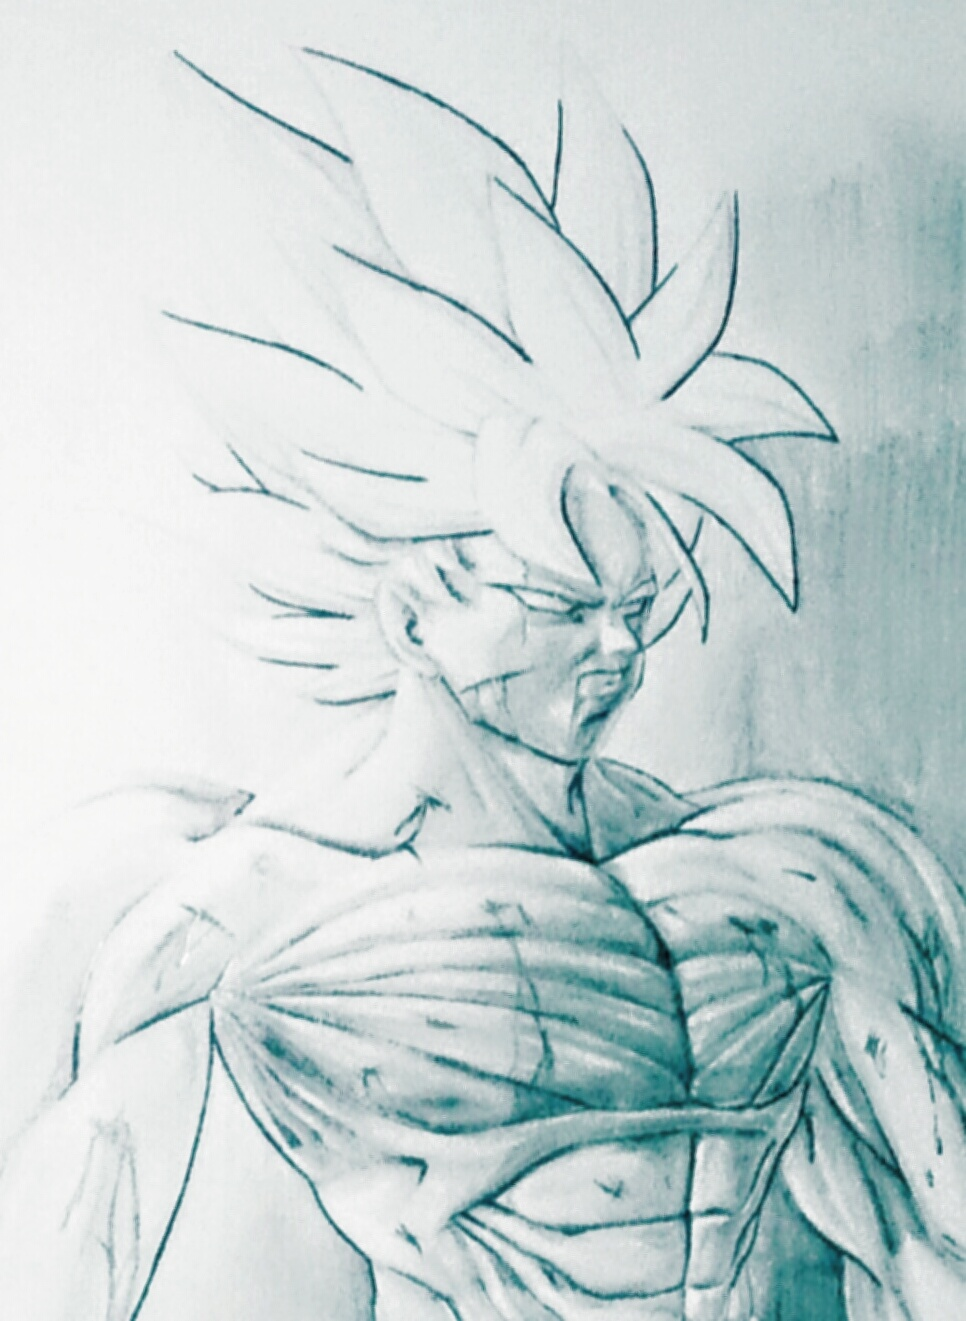 Goku Battle Damaged By Novasayajingoku On Deviantart